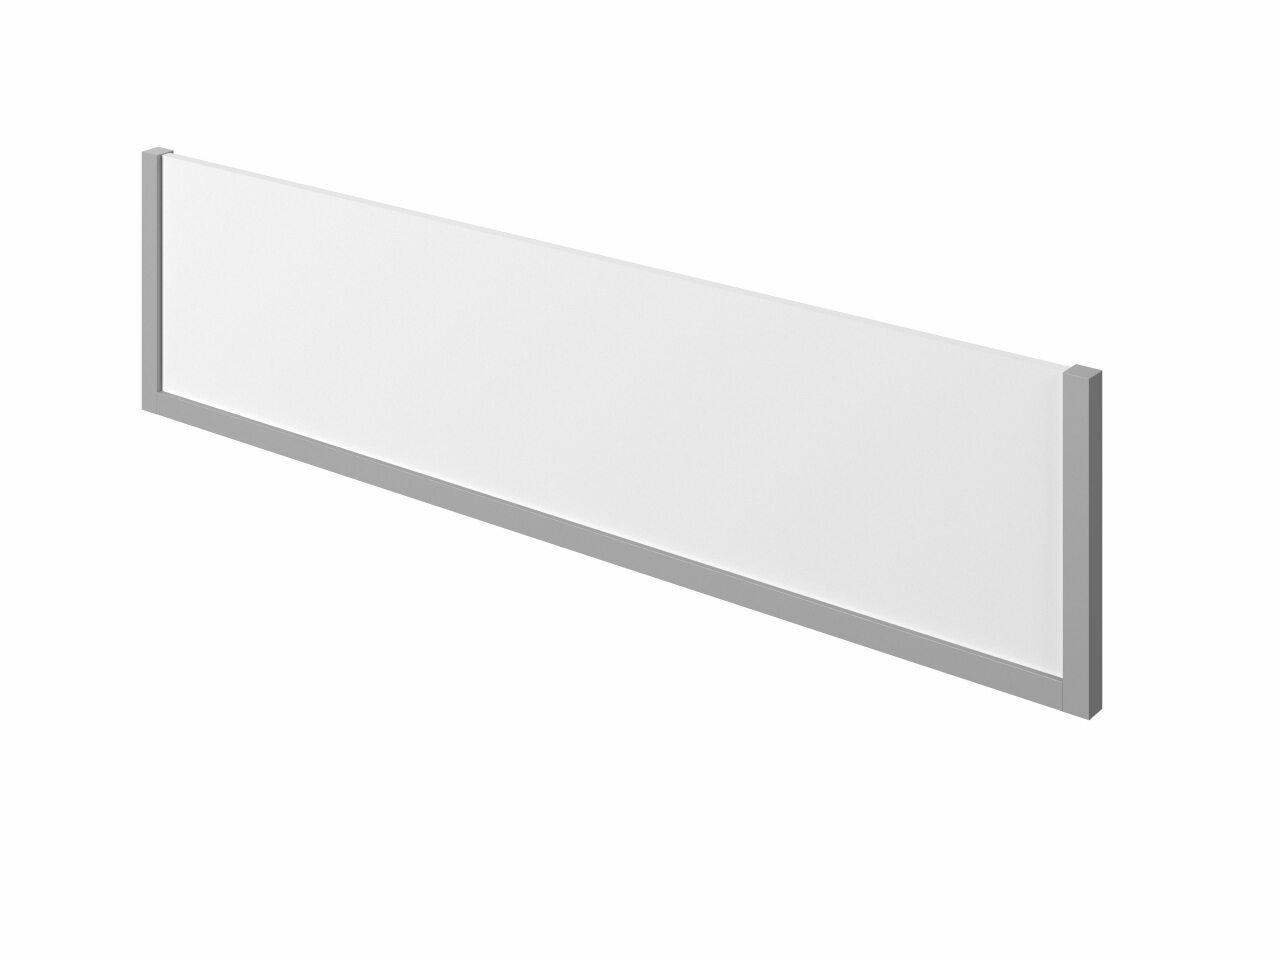 Экран ЛДСП с декоративными элементам  Public Comfort 150x4x37 - фото 1